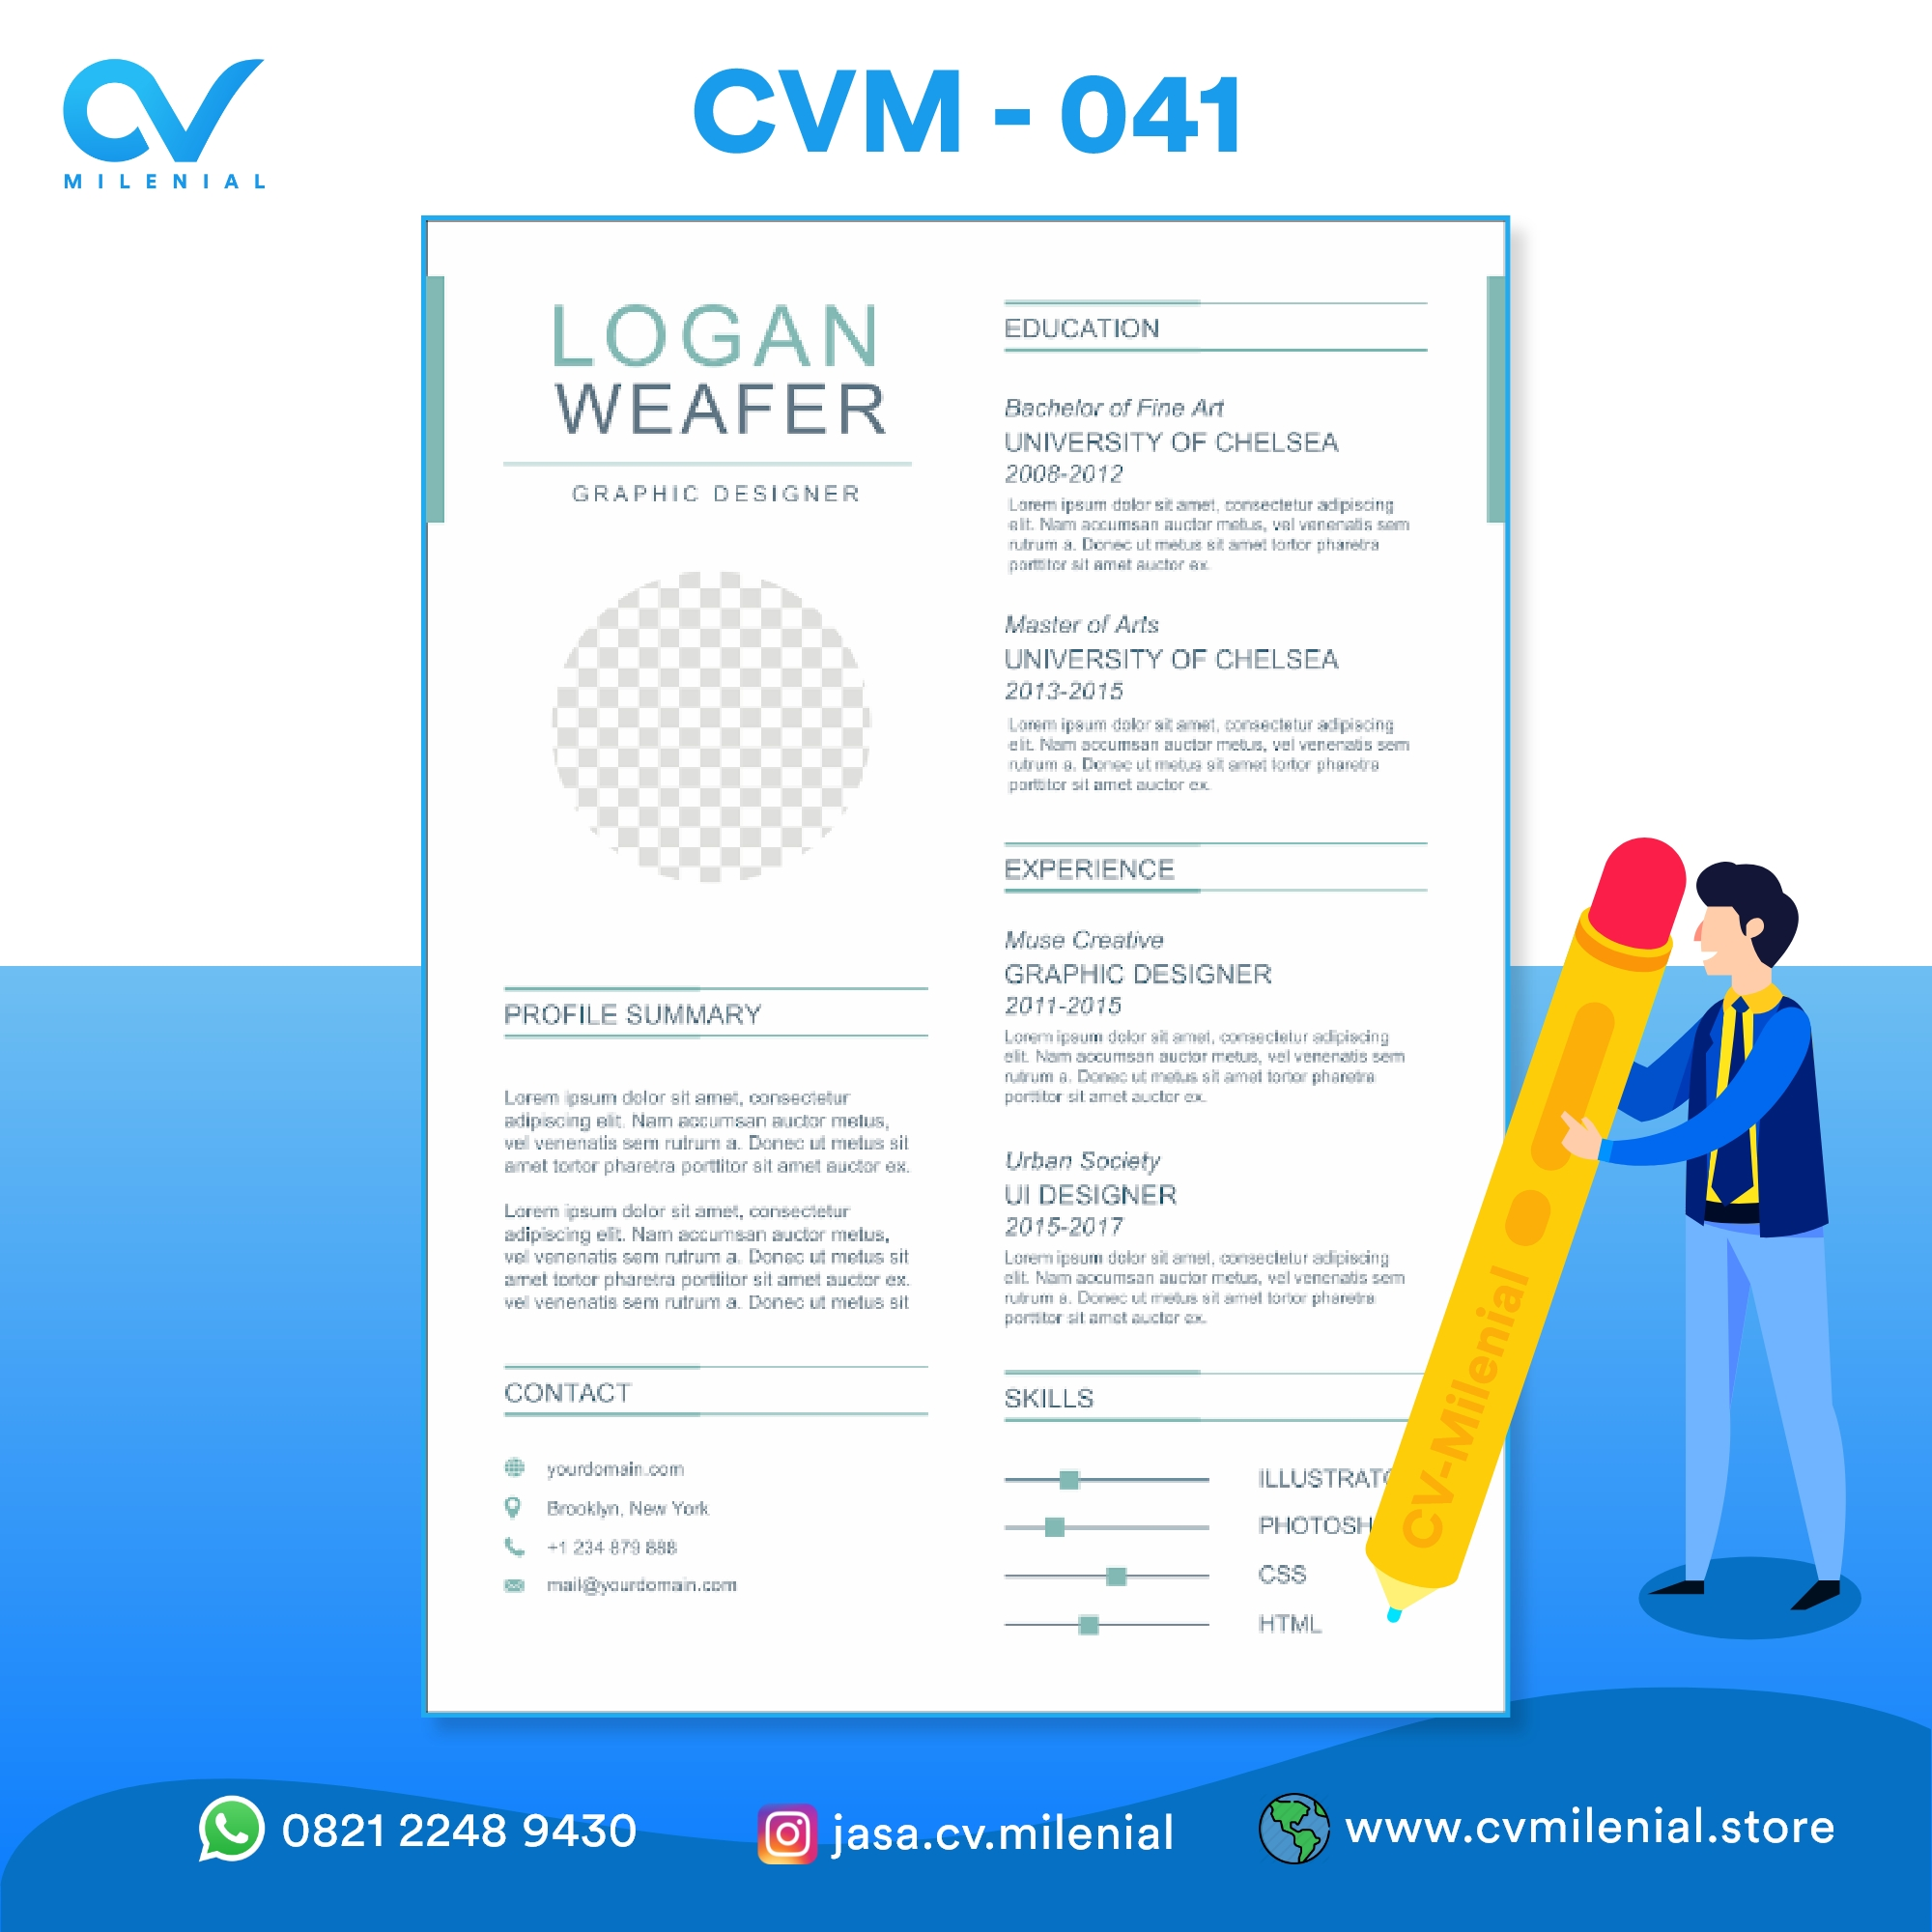 https://cvmilenial.com/assets/image/desain_cv/41.jpg